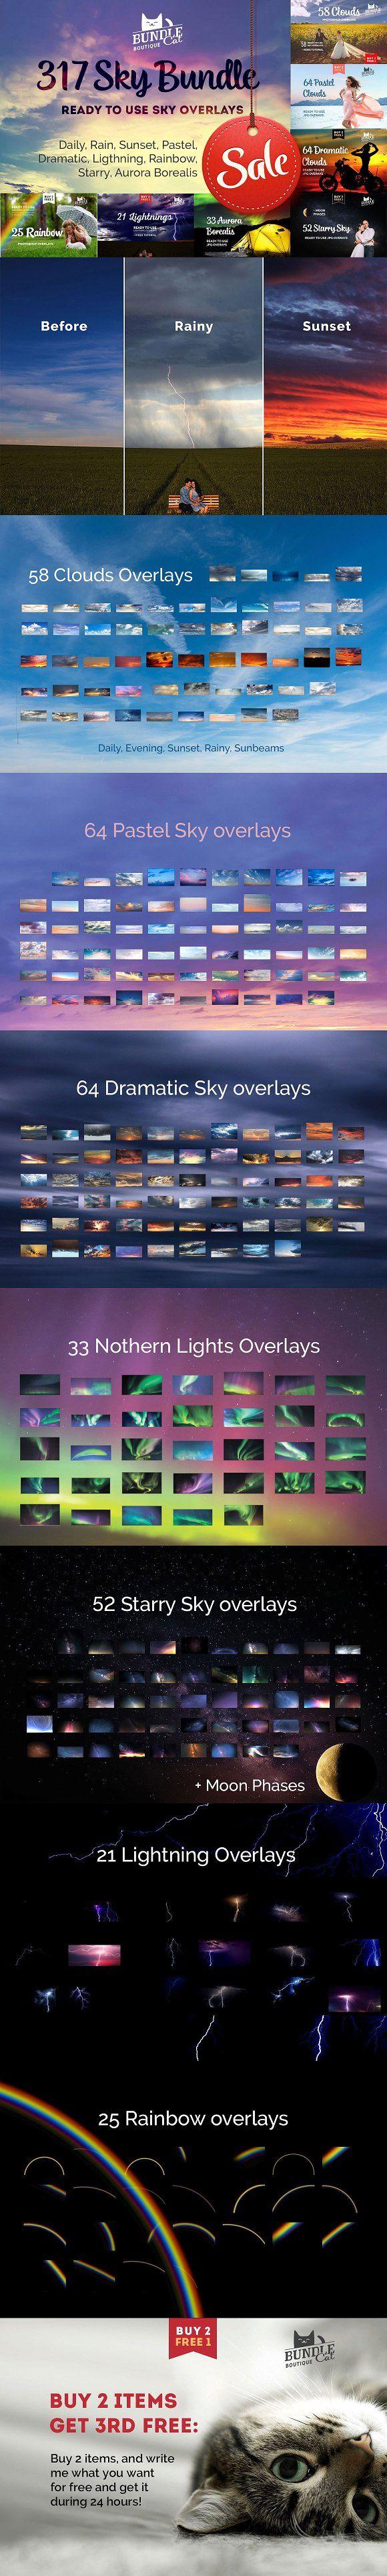 The 28 best Photoshop Overlays images on Pinterest | Photoshop ...